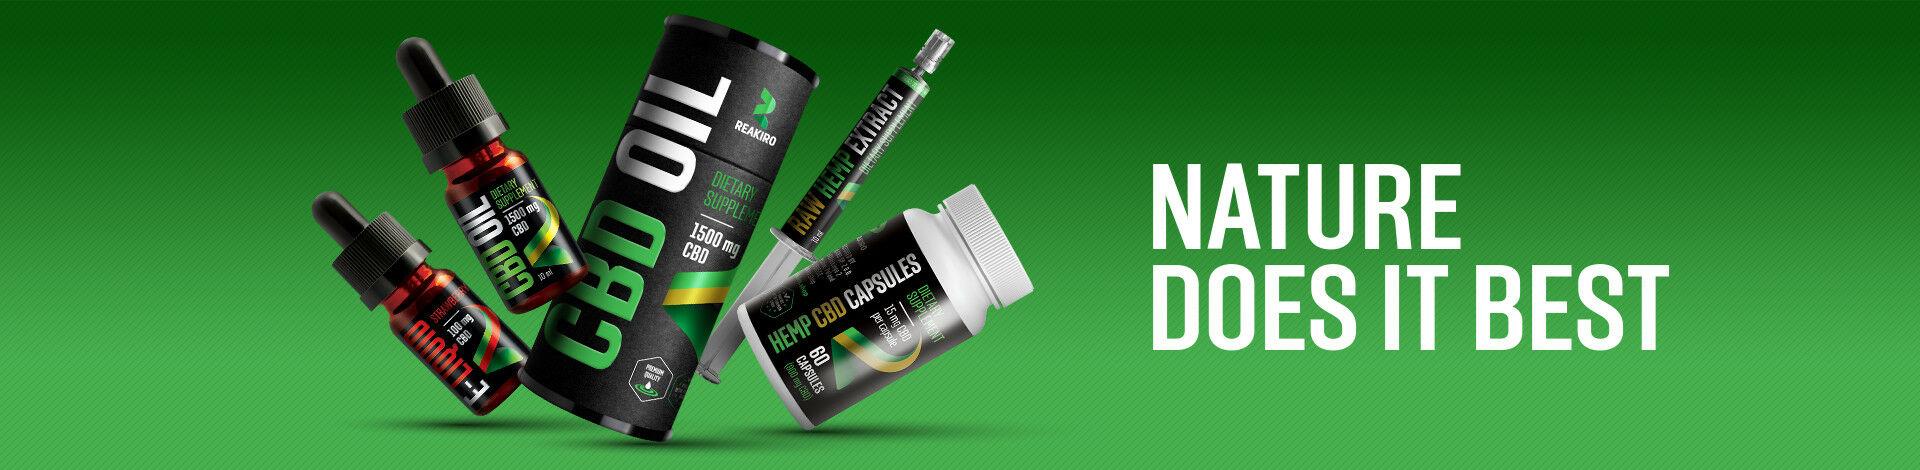 cbd-olaj-forgalmazasa-gyogynoveny-biobolt-drogeria-online